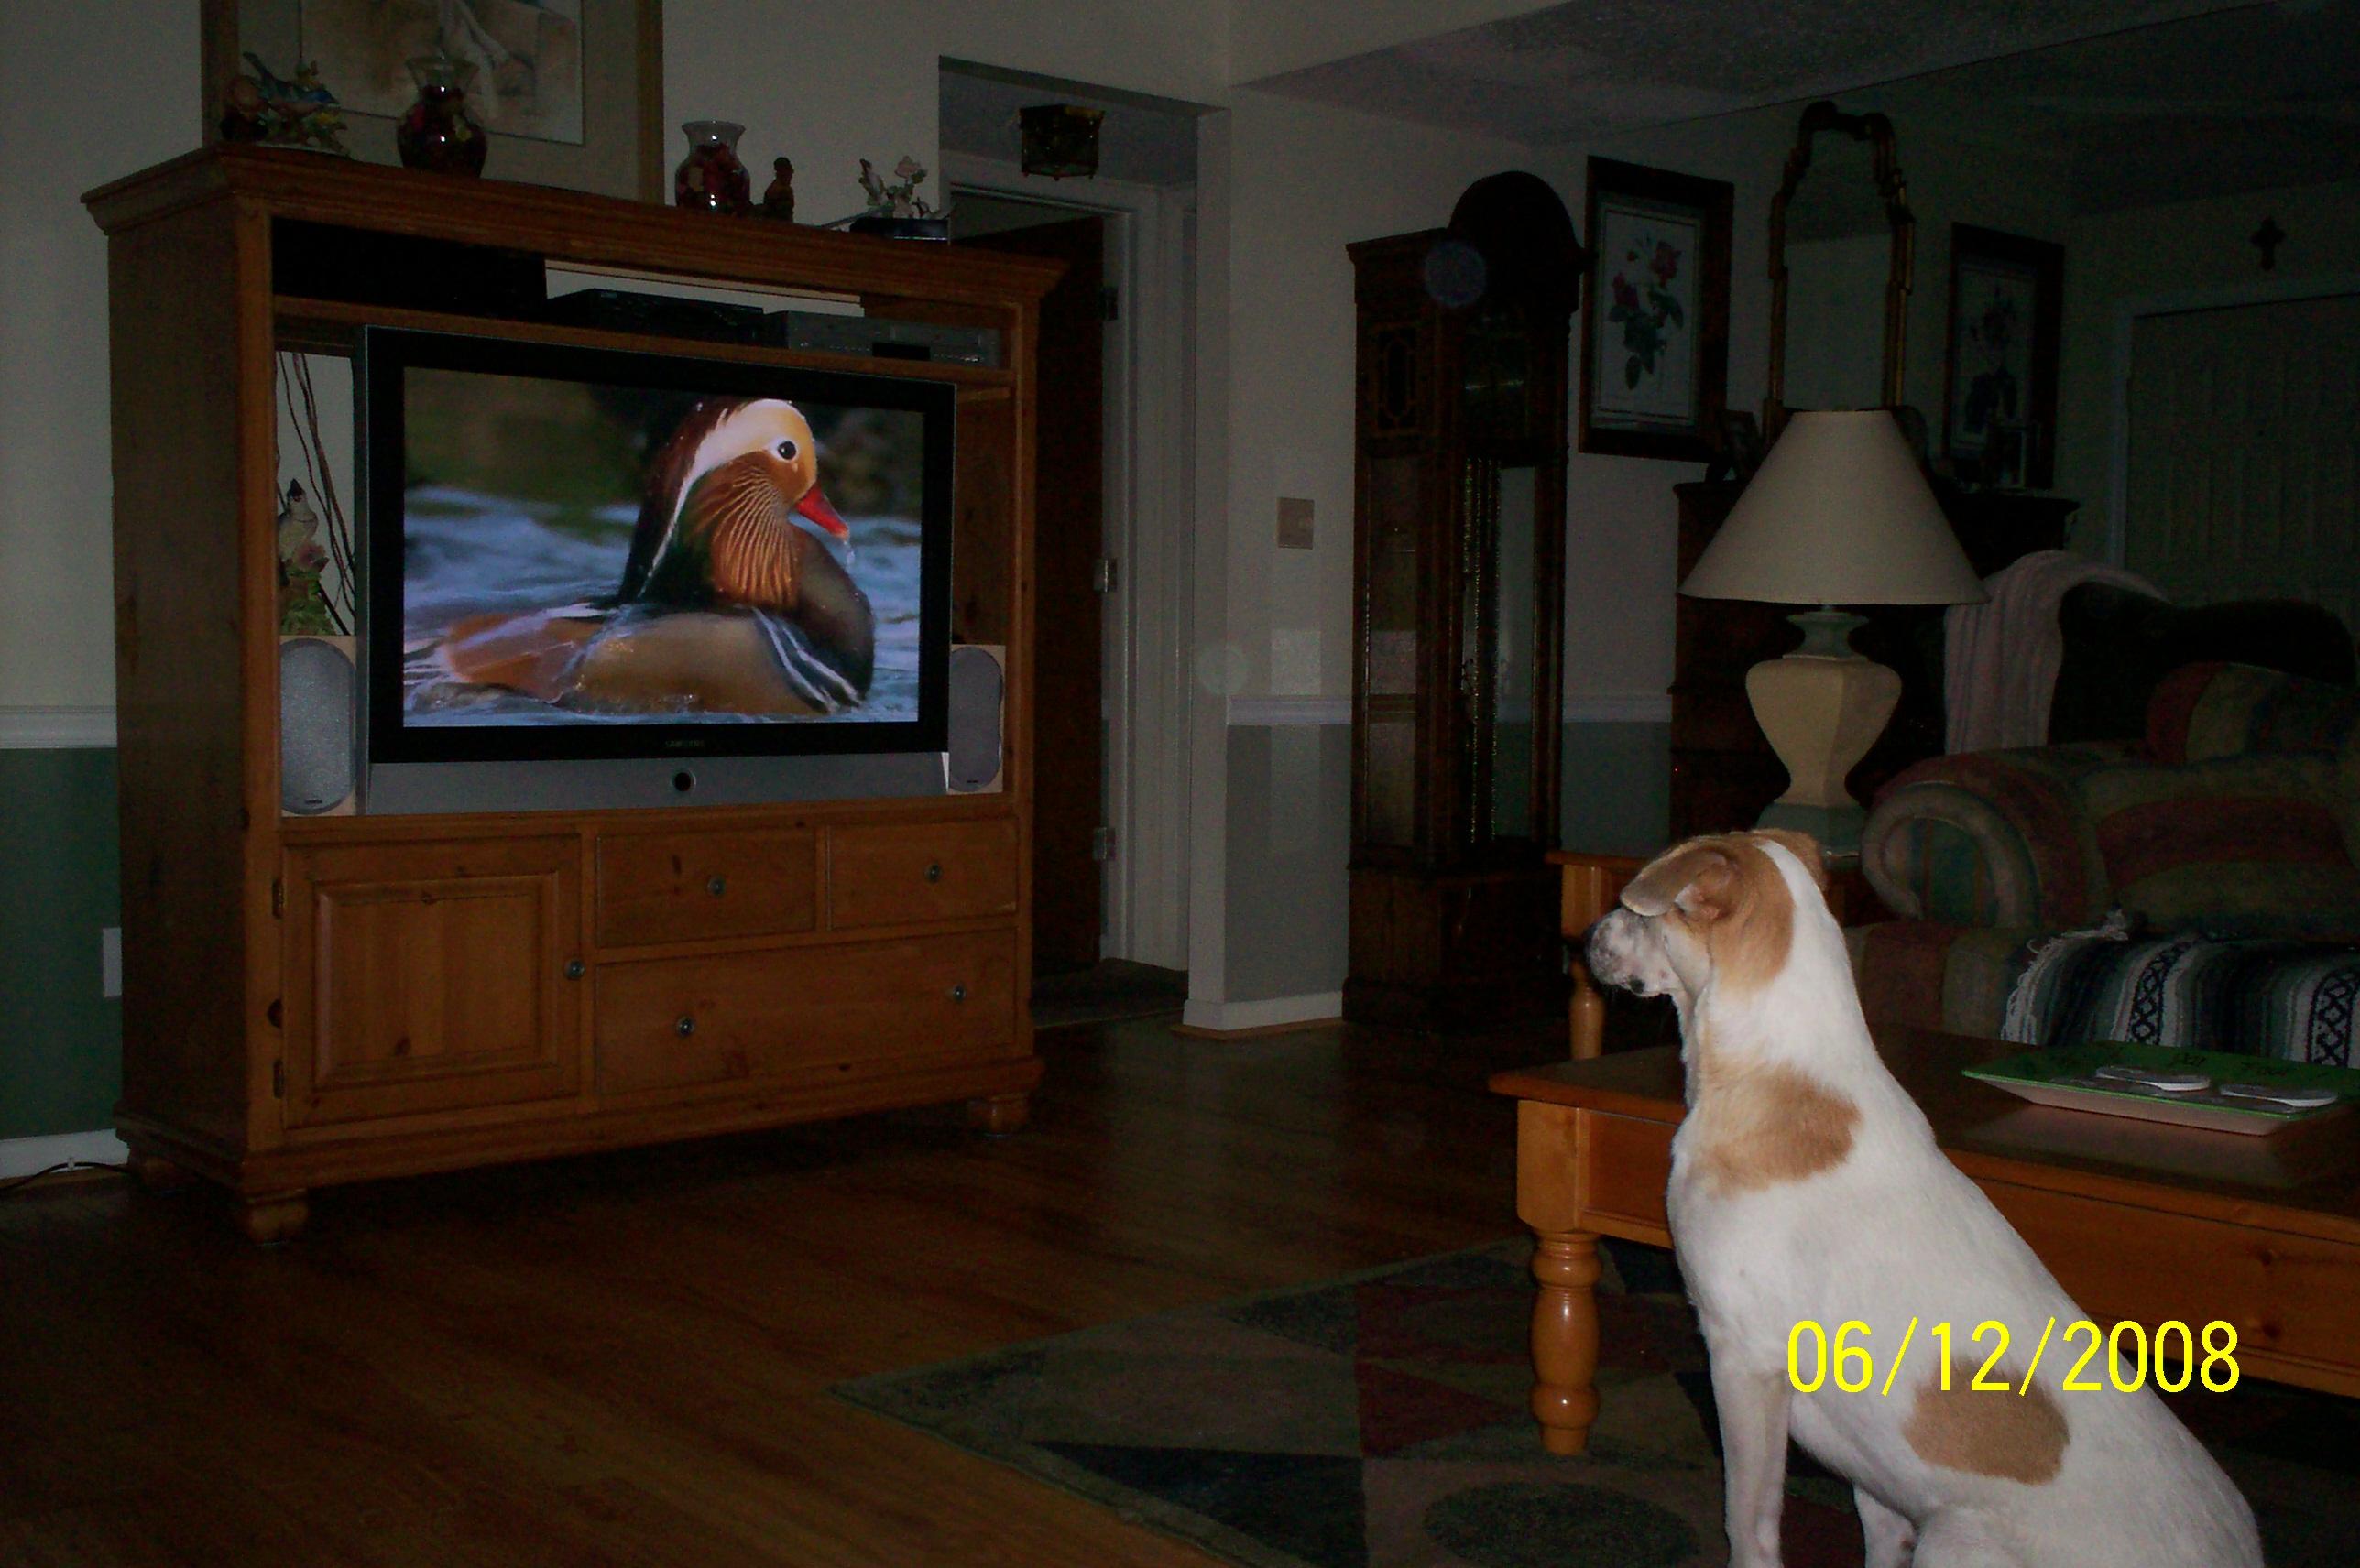 Taylove TV